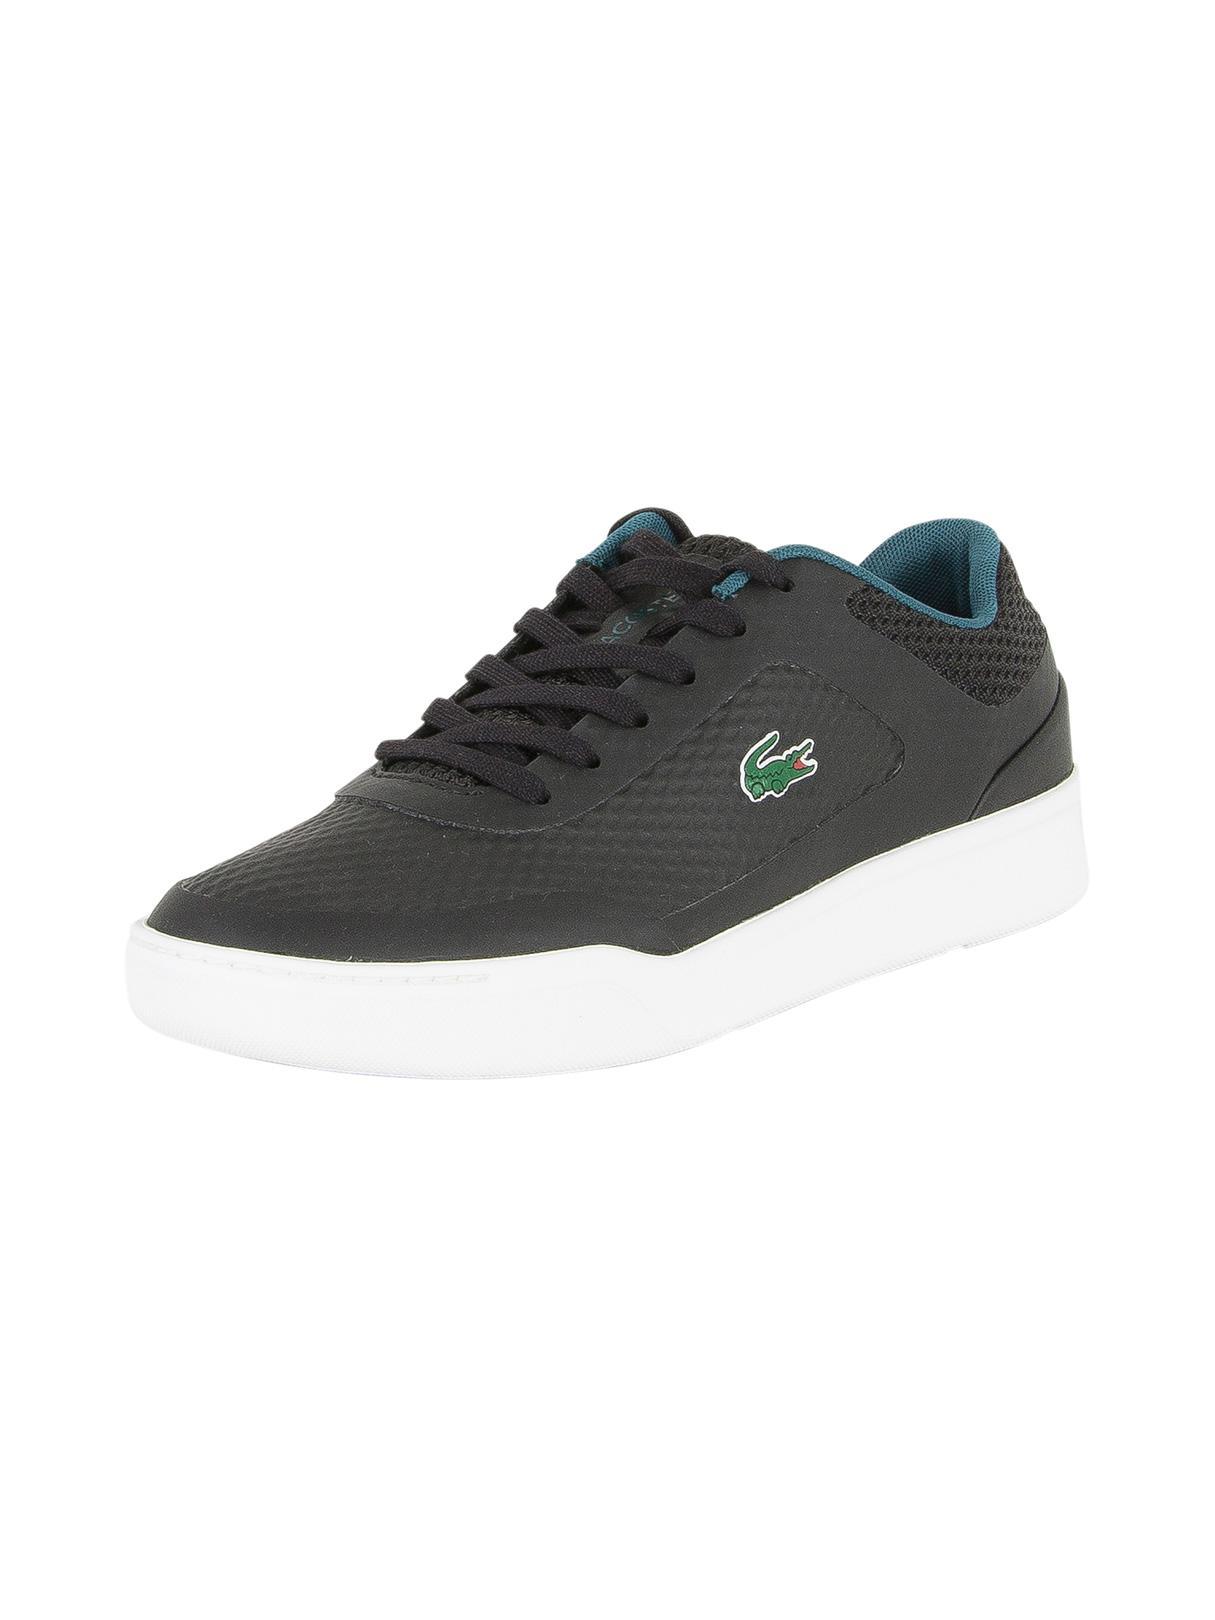 EXPLORATEUR SPORT - Sneaker low - black/light tan Auslass Heißen Verkauf eN2xob